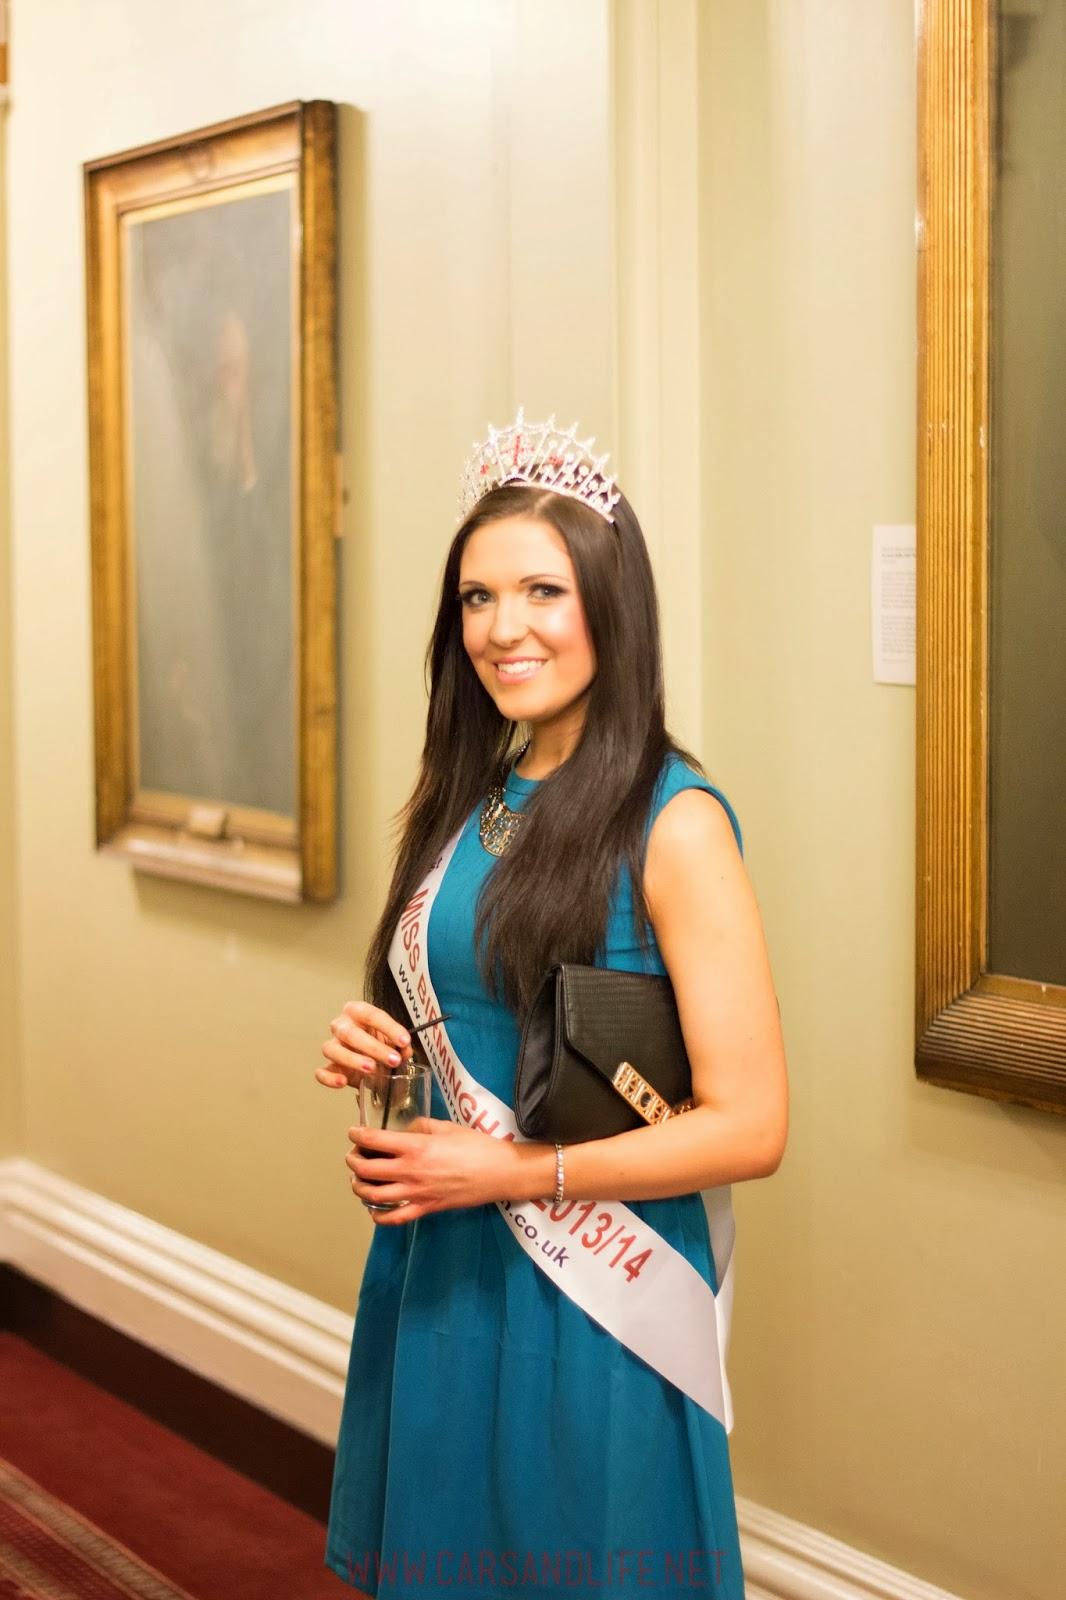 Miss Birmingham 2013 | Rachael Barker